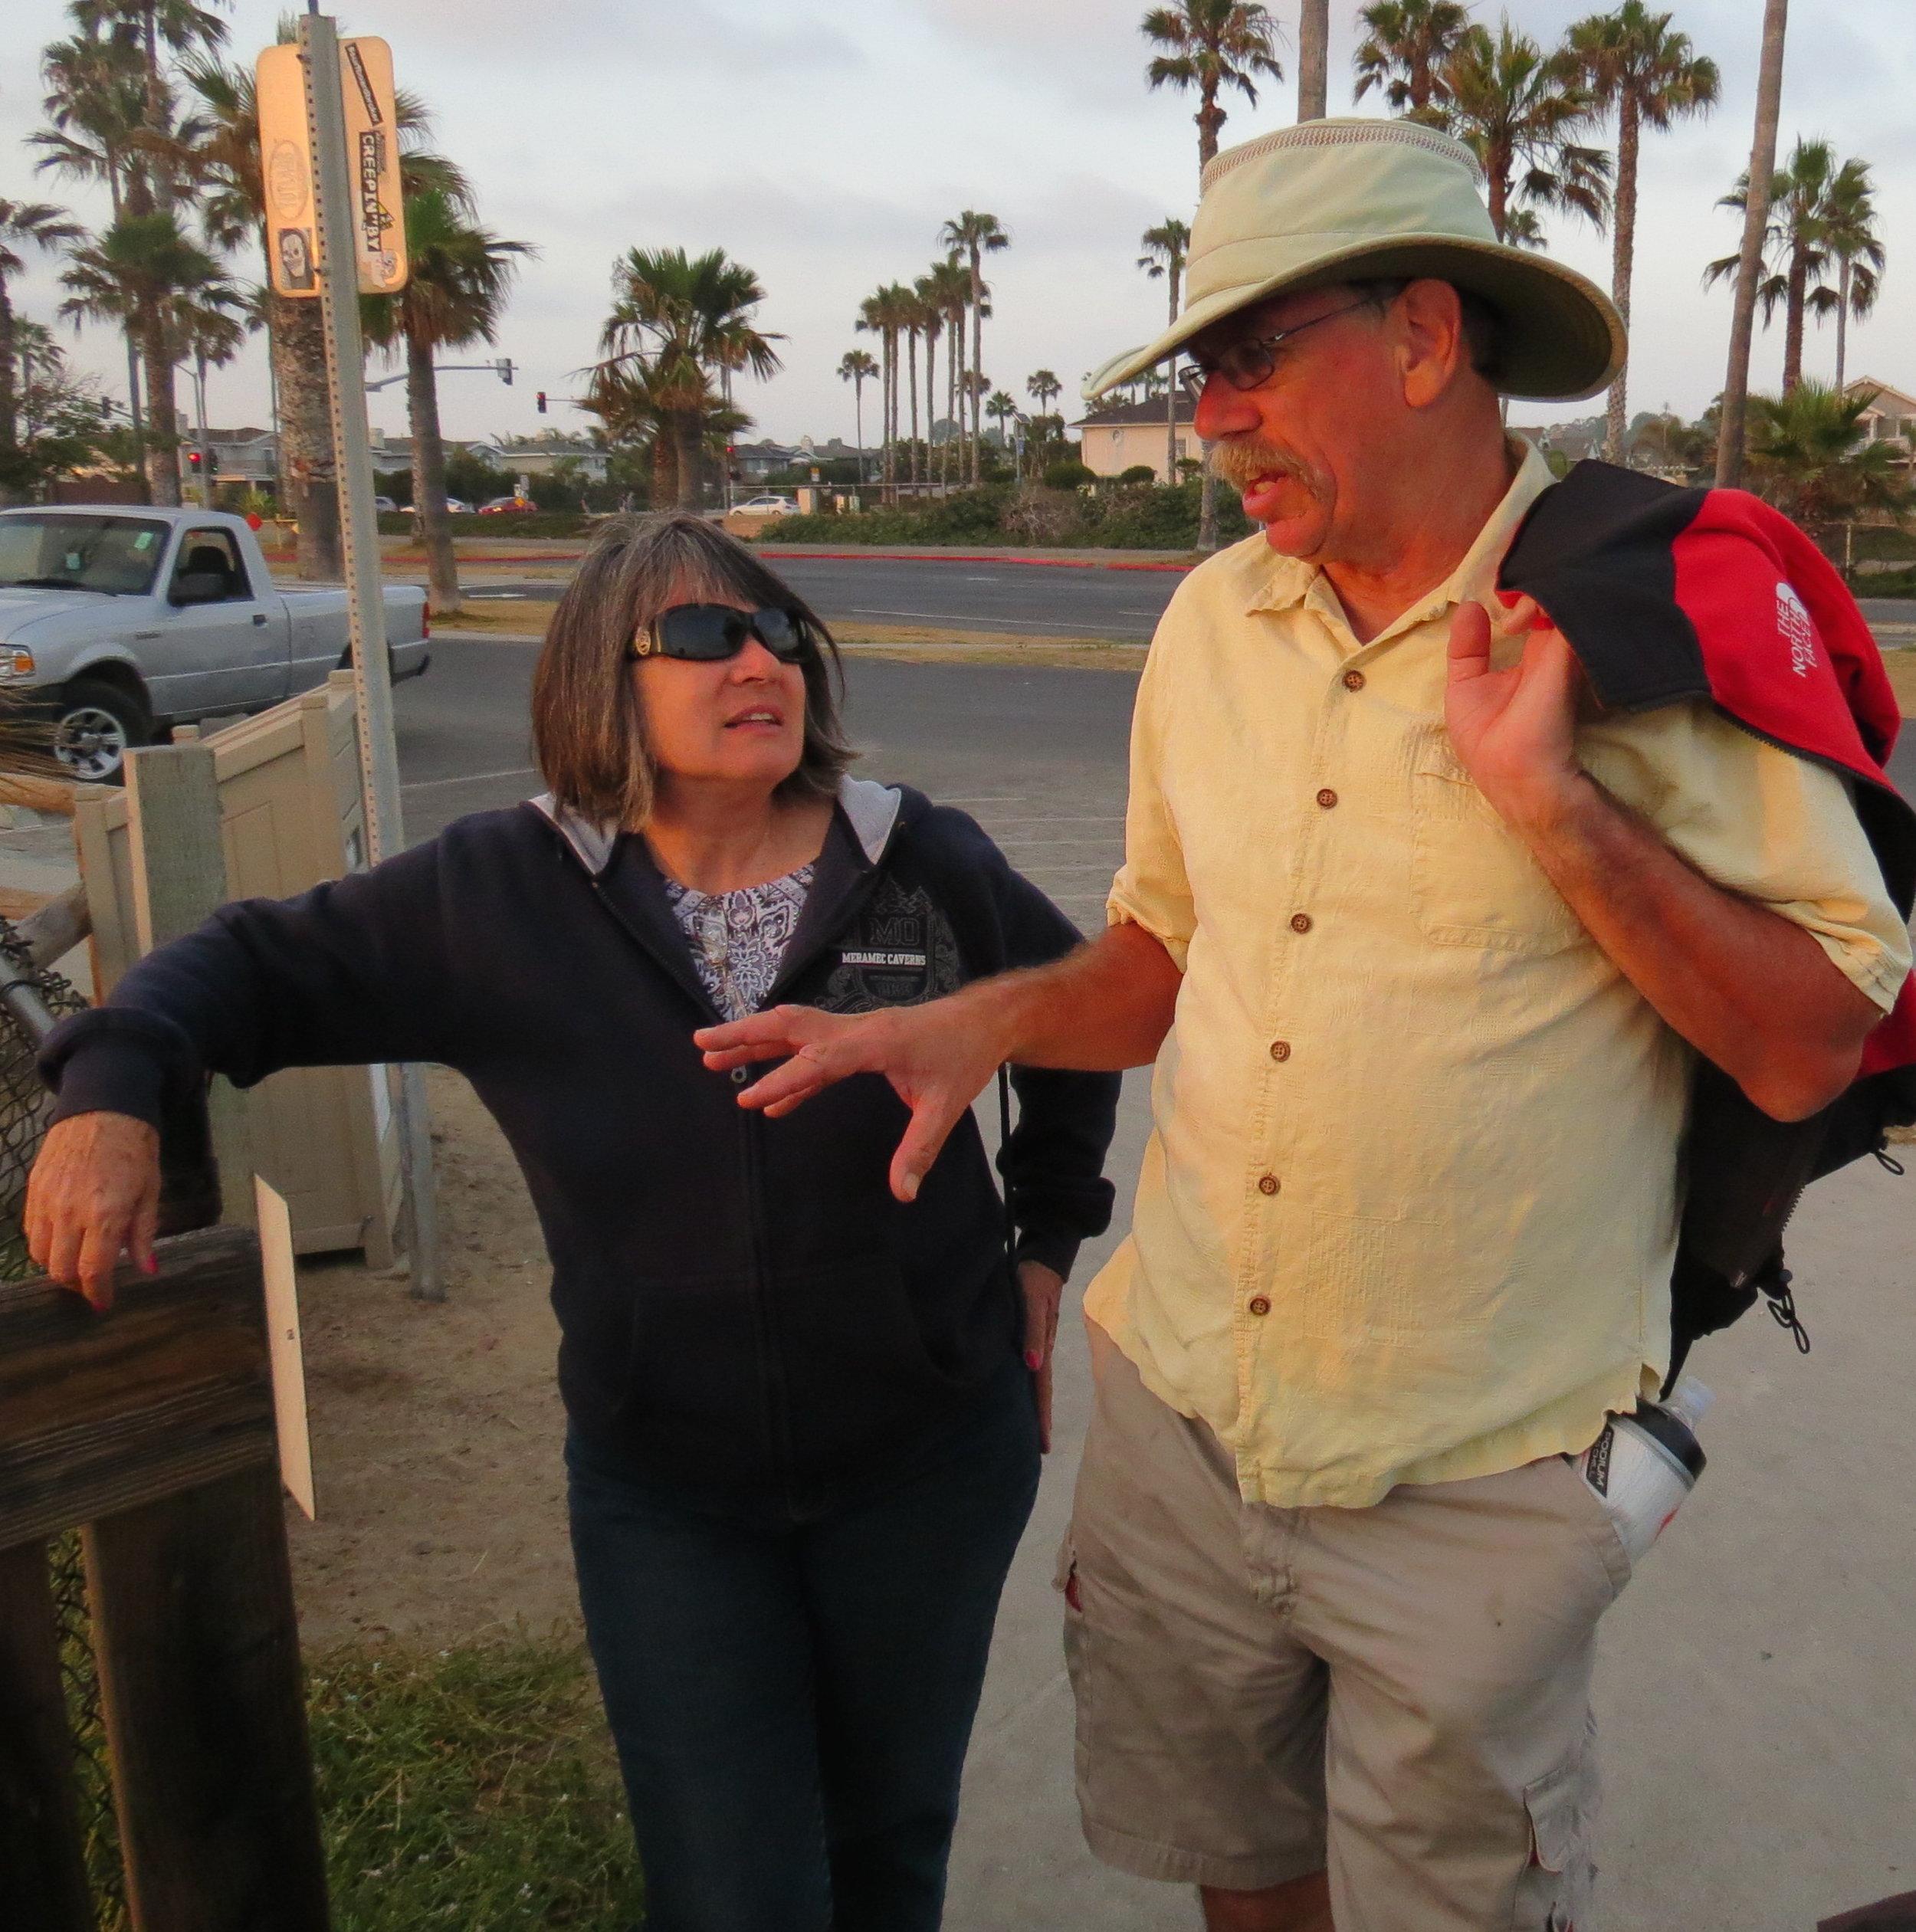 Karen & Bruce at the Summer Solstice Tour susnset